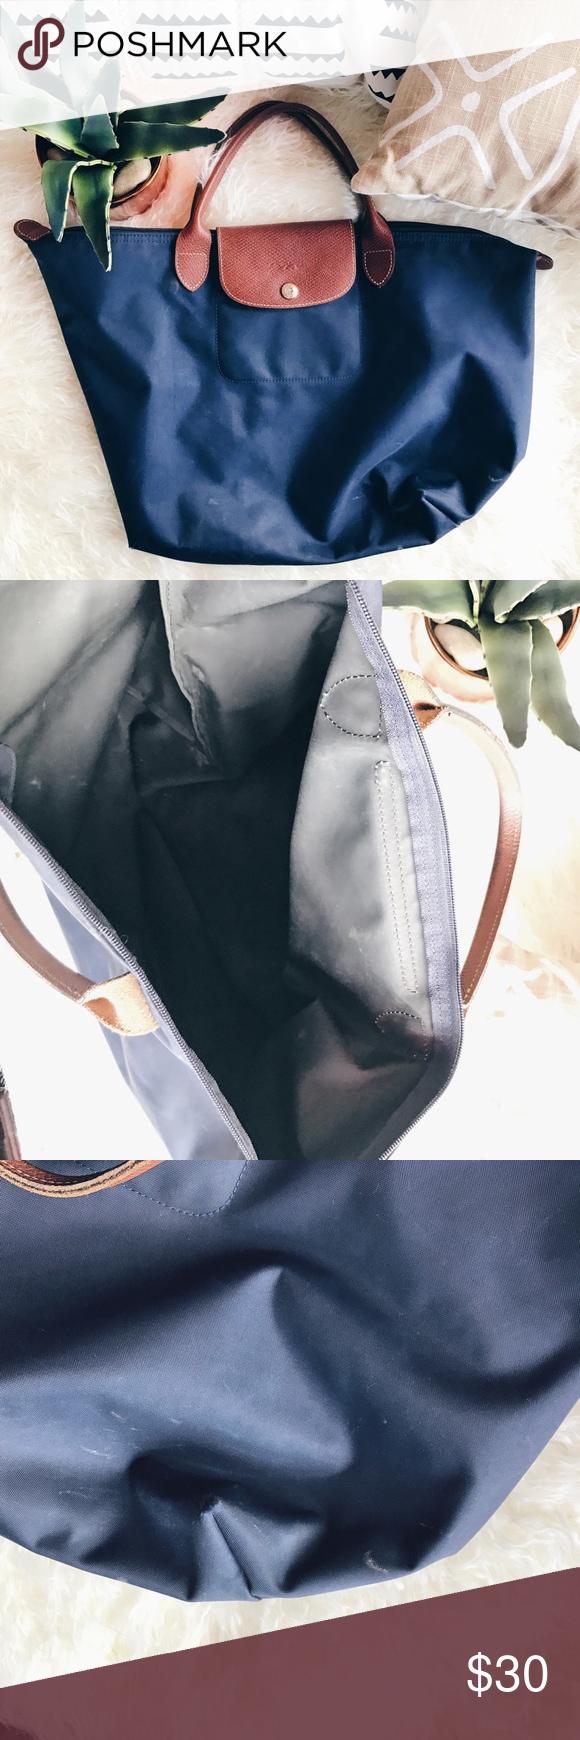 Long champ Handbag Navy Long champ handbag . Has a tiny hole on the side of the bag (picture below) Longchamp Bags